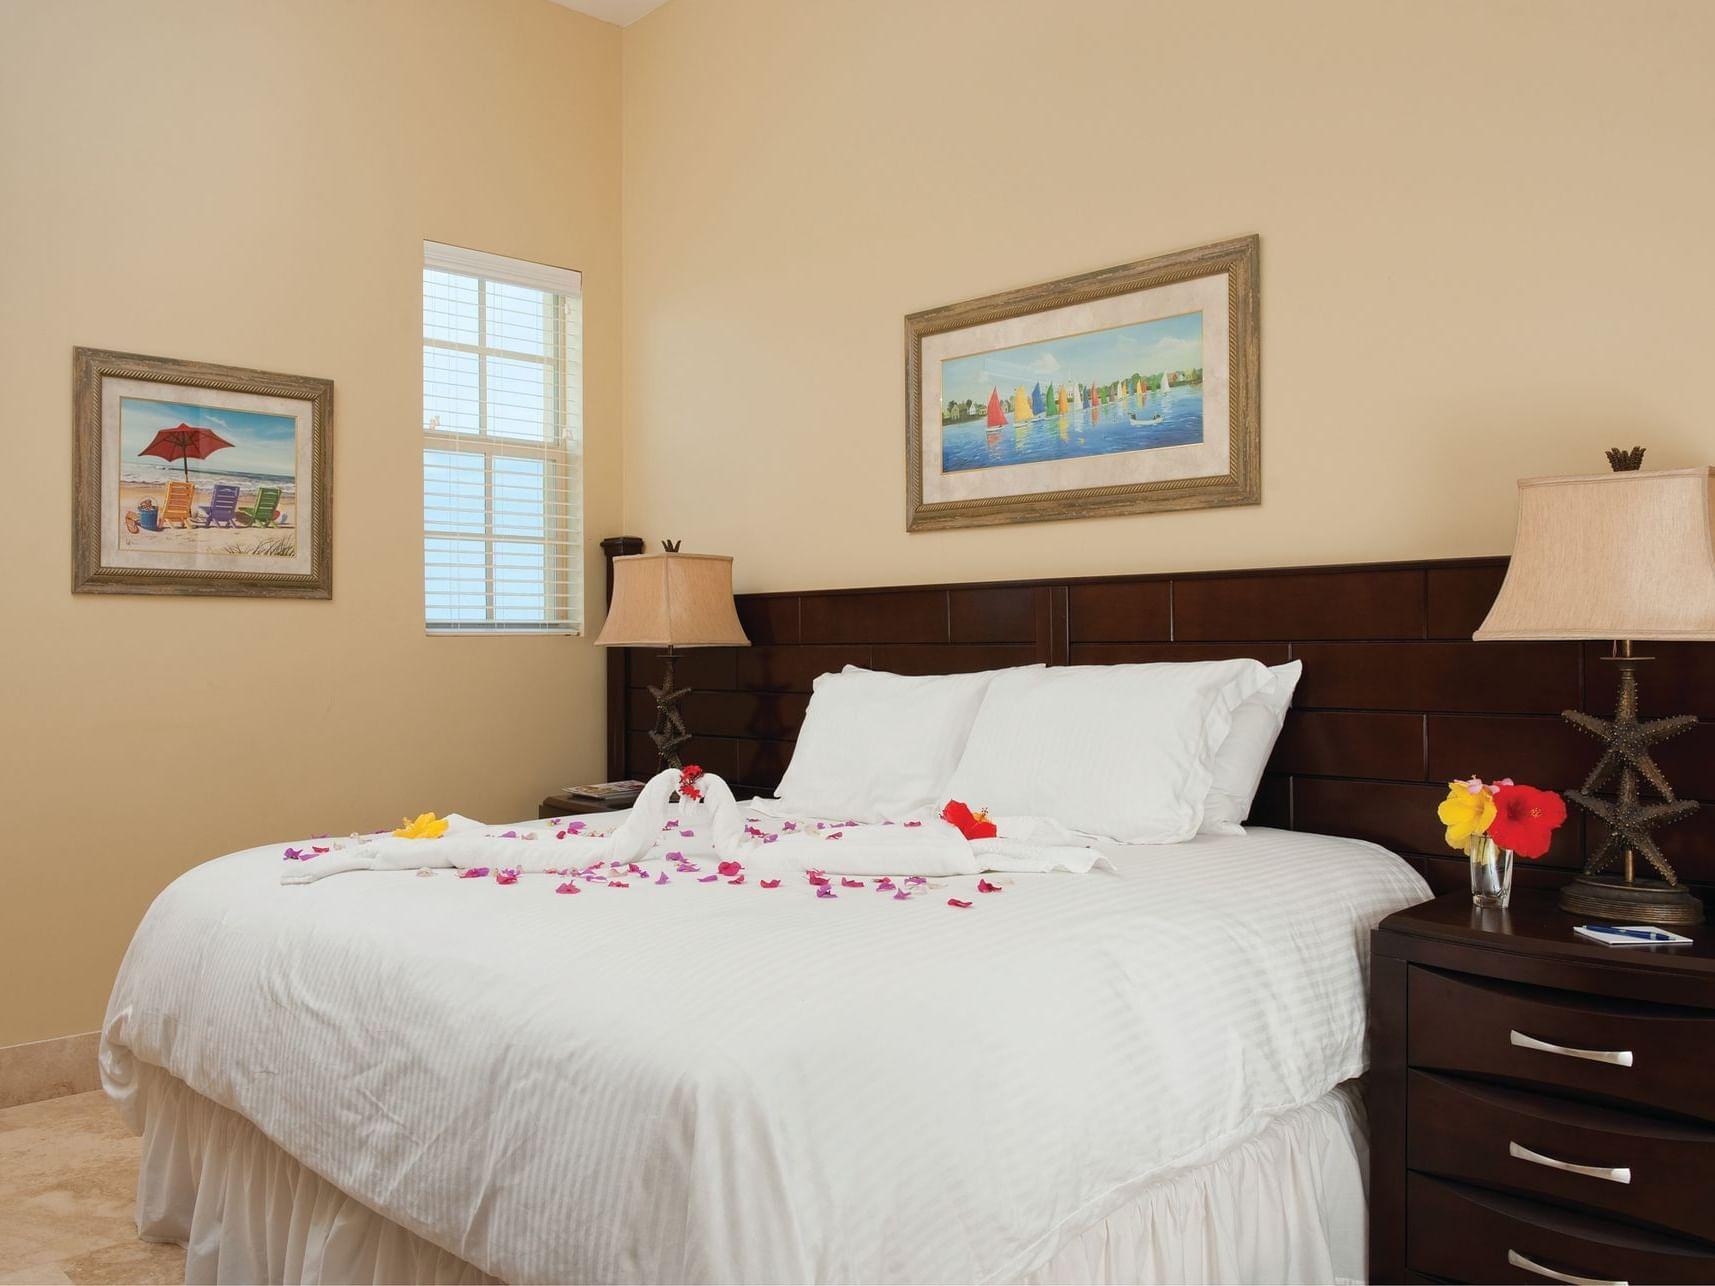 Bedroom of Standard Room at Windsong Resort On The Reef